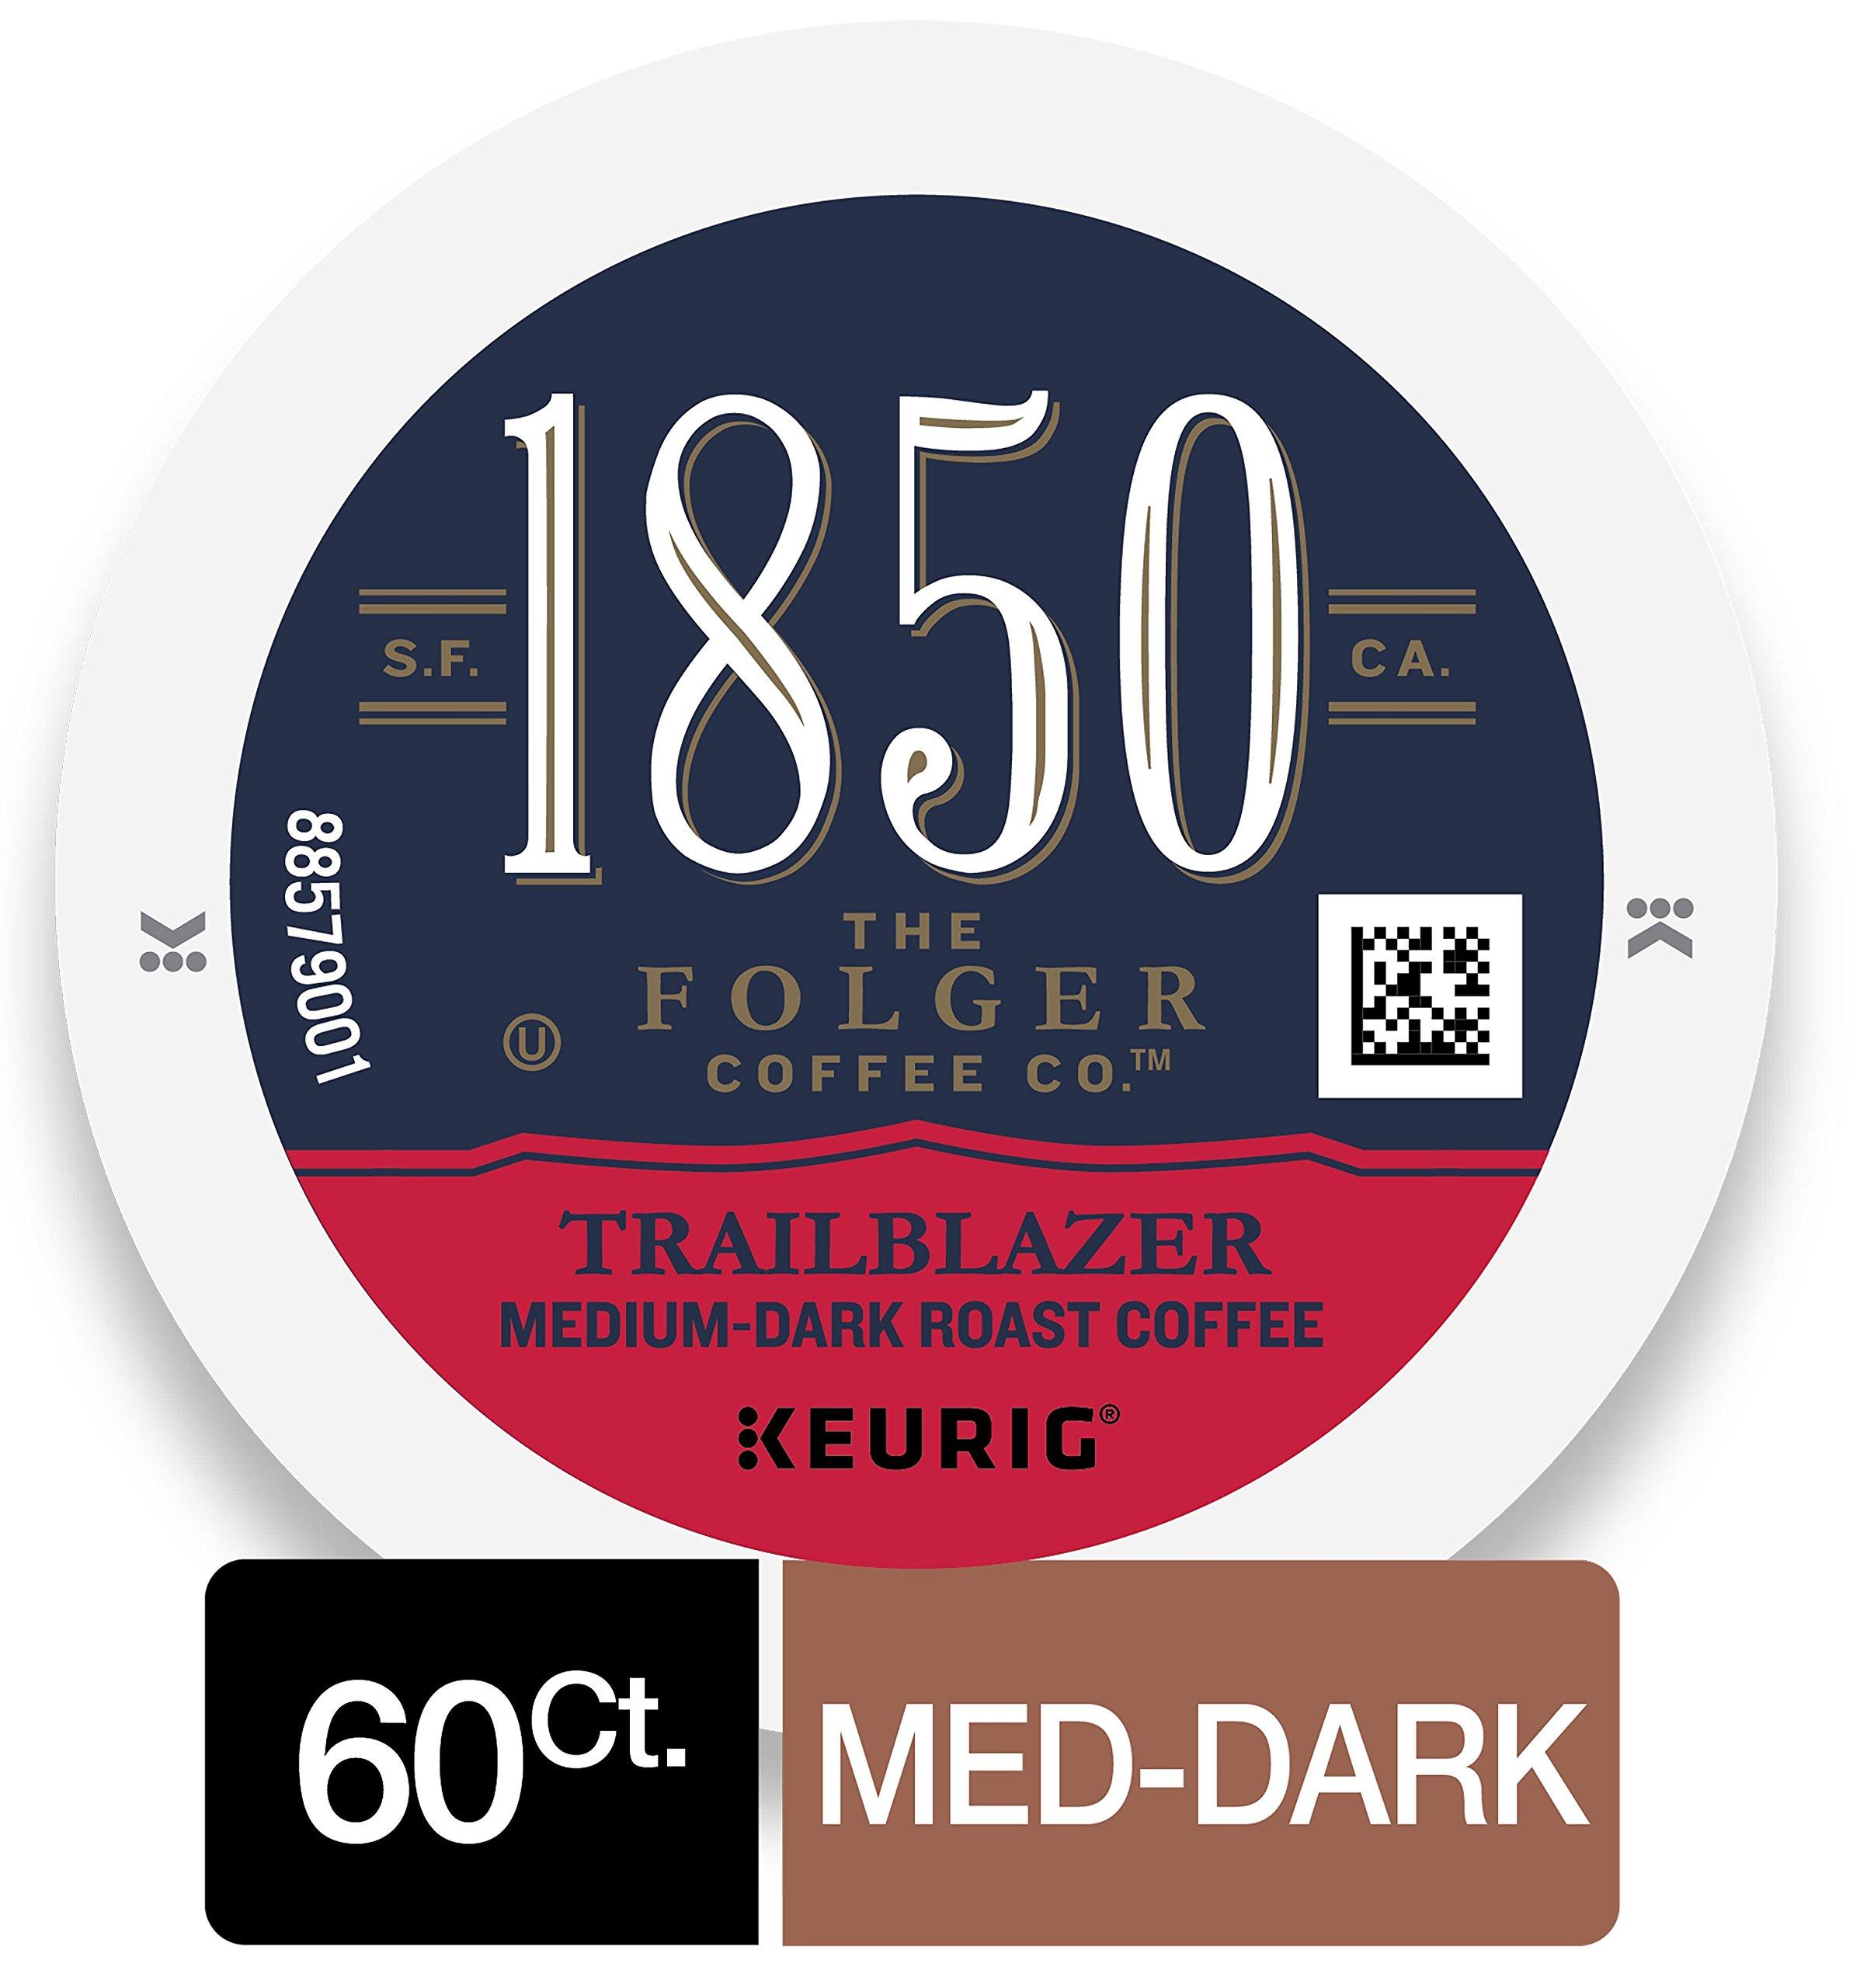 Trailblazer Medium Dark Roast Coffee